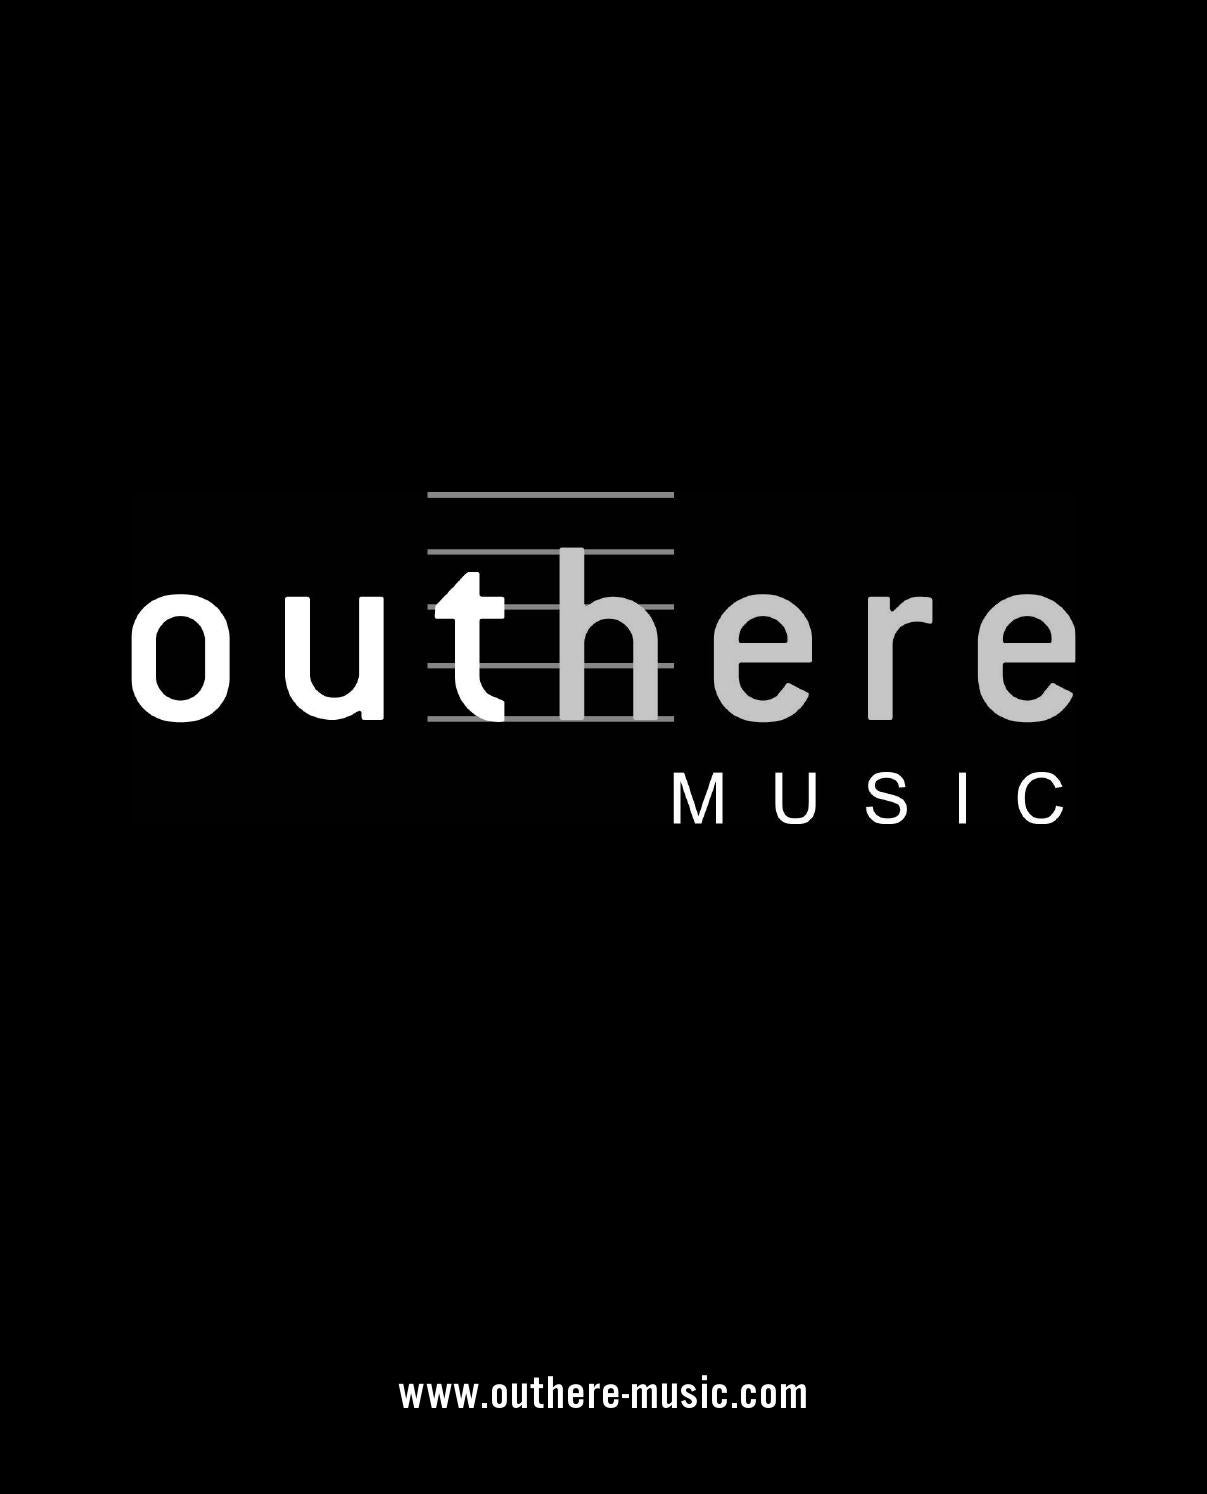 Catalogue des nouveautés Outhere Music Juillet - Décembre 2015 by Outhere  Music - issuu